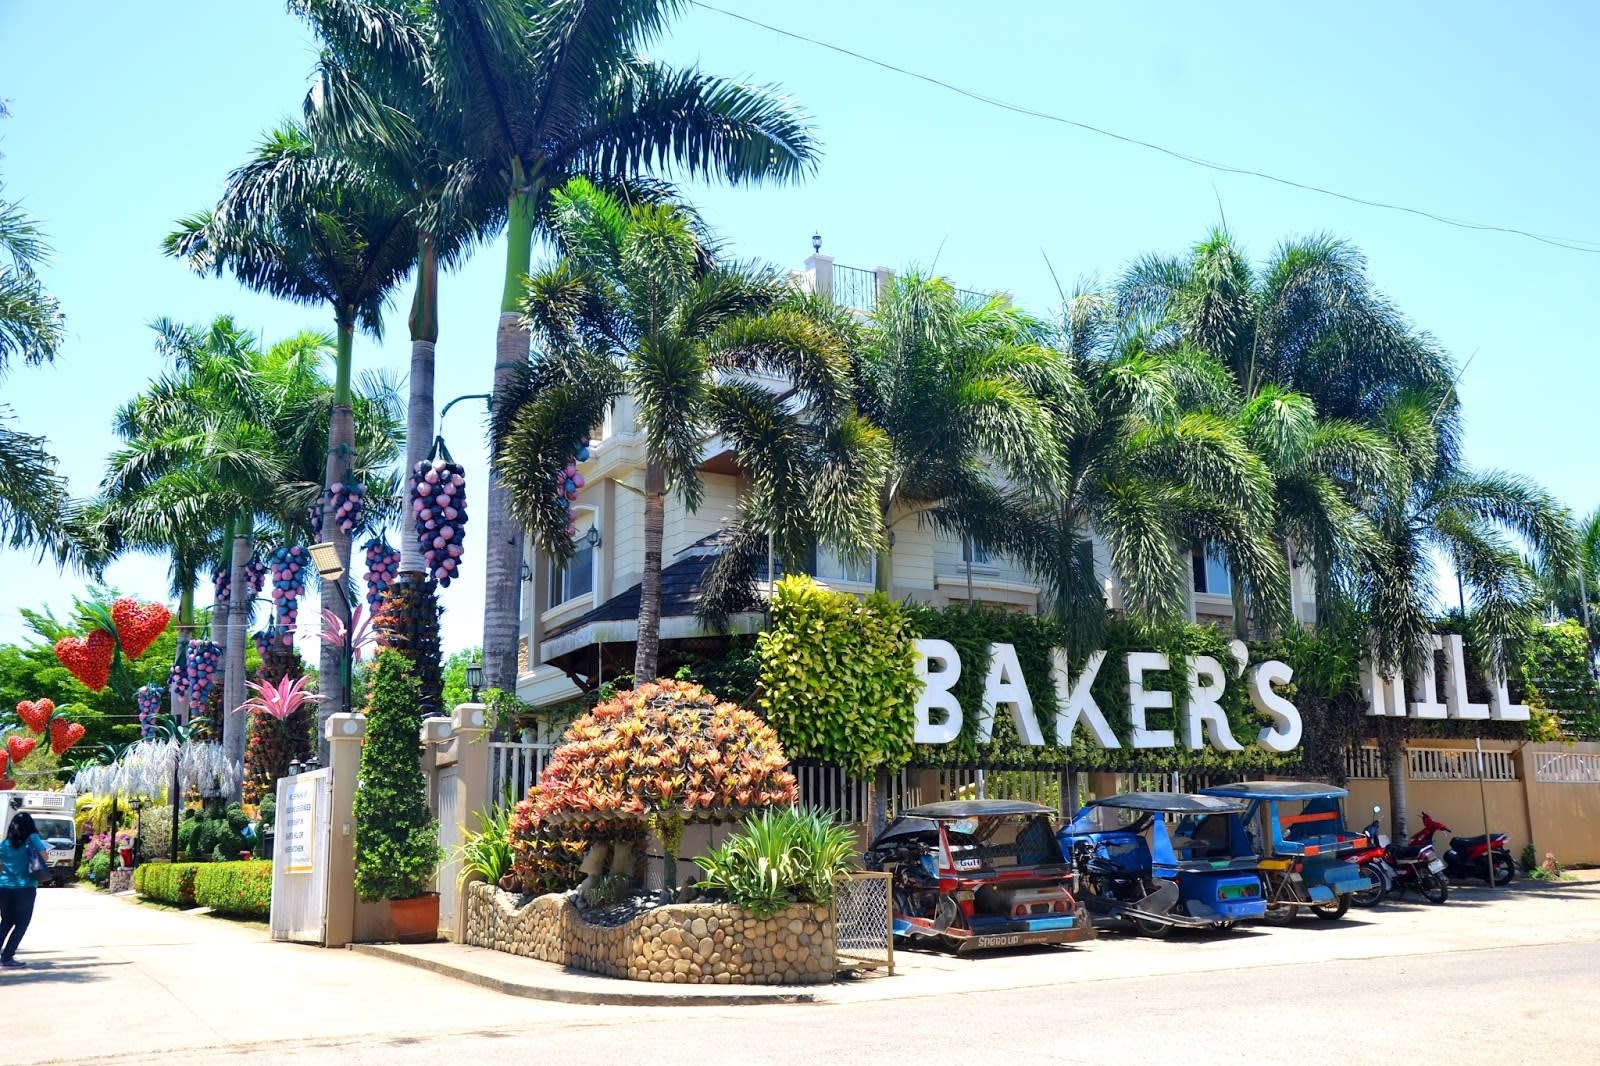 圖片取自https://nicerioadventures.blogspot.com/2018/02/palawan-bakers-hill.html